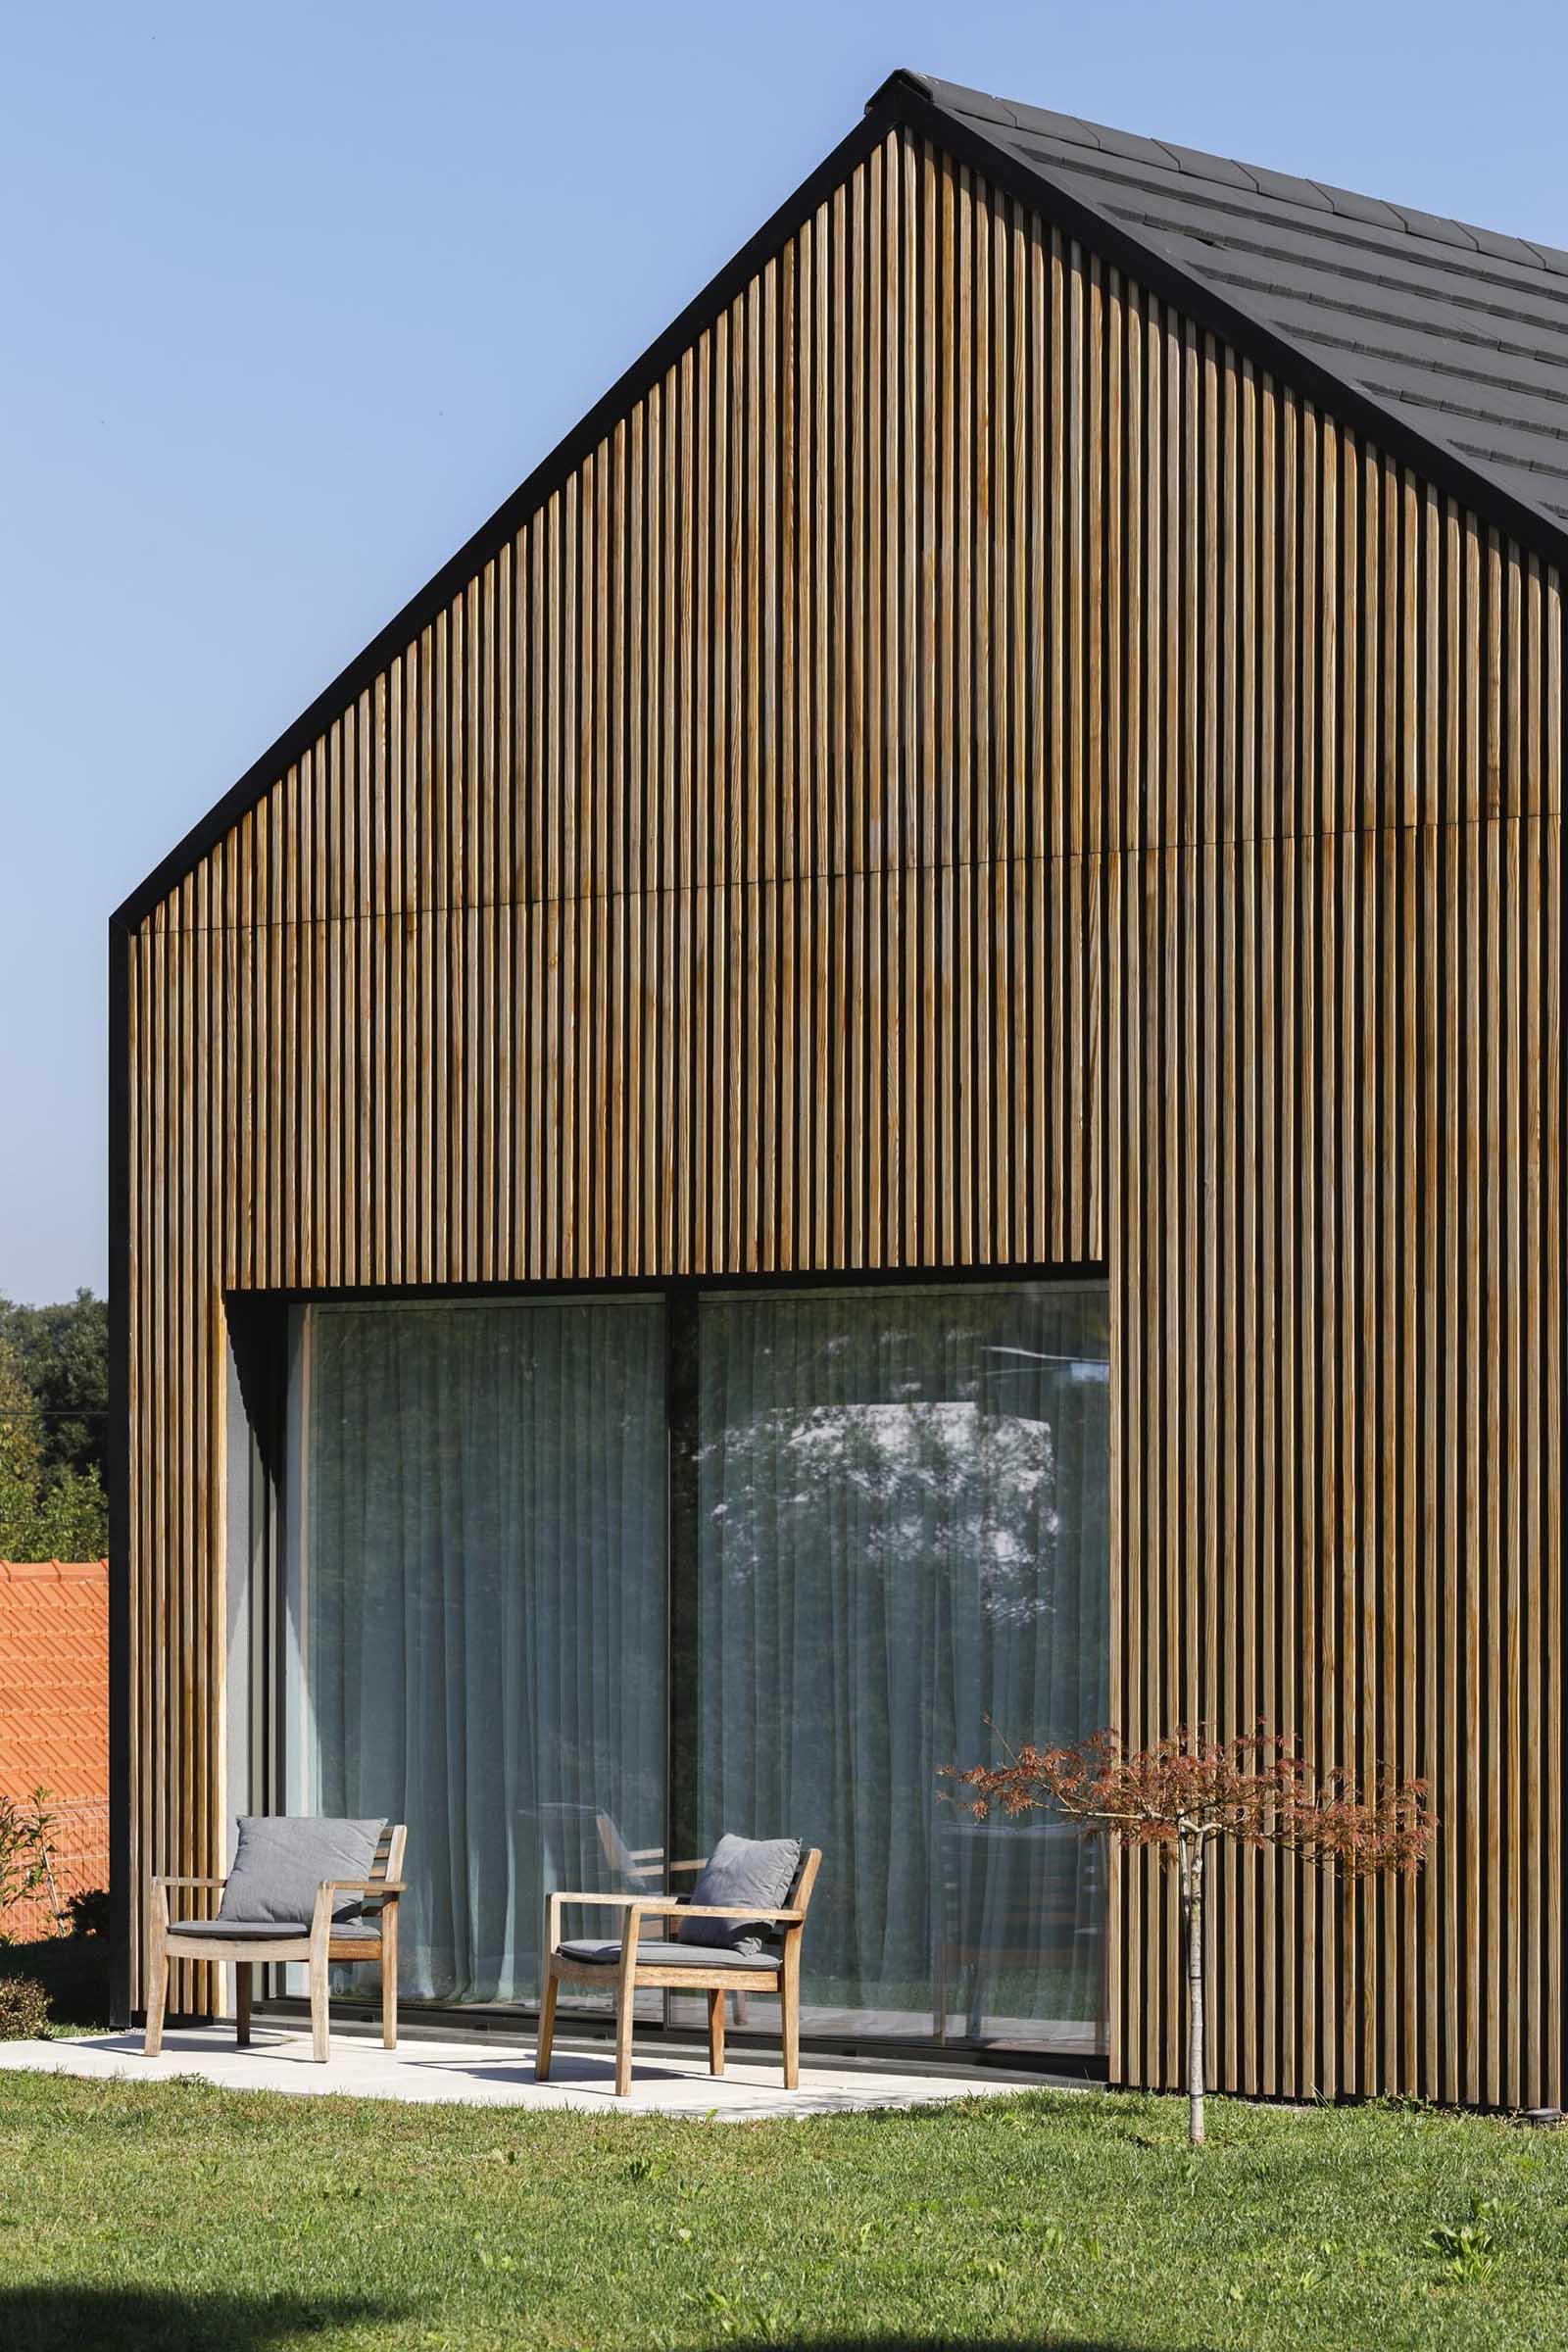 A modern house with a wood slat facade.